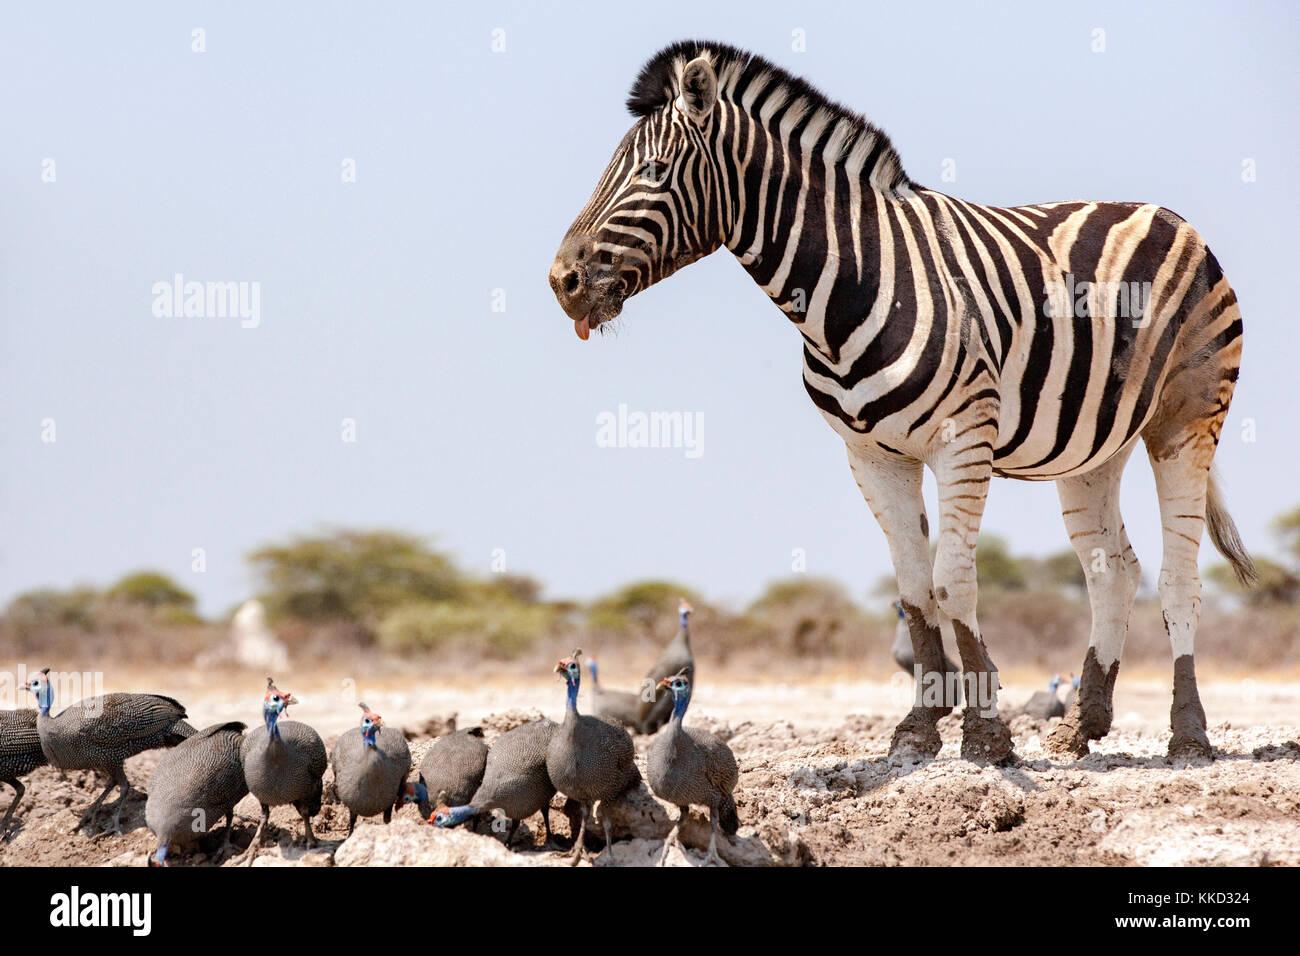 La cebra de burchell (Equus quagga burchellii) - ocultar onguma onkolo, reserva de caza, Namibia, África Imagen De Stock